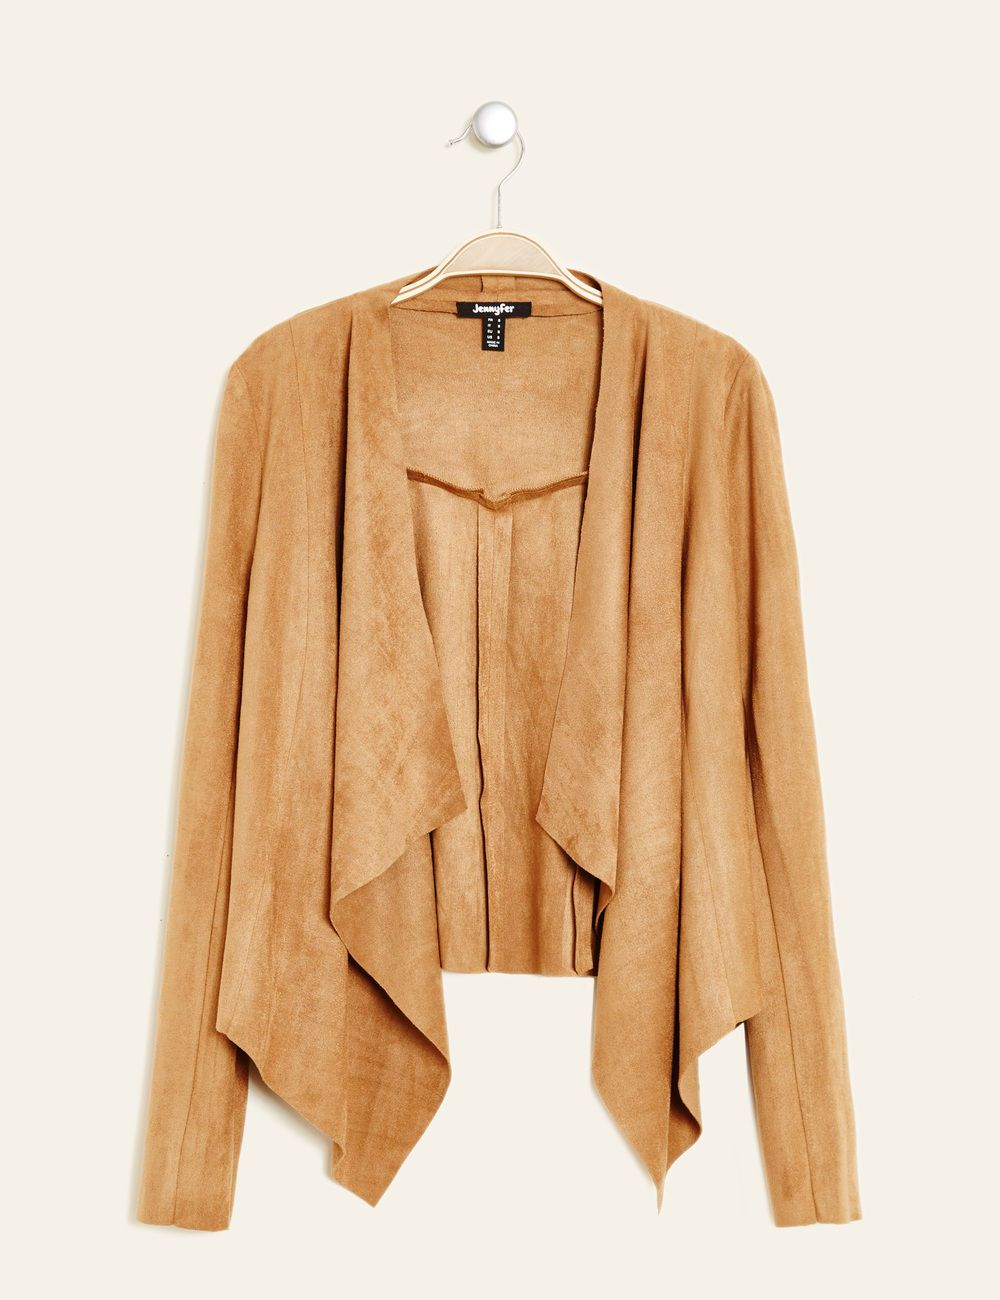 Veste tailleur camel femme